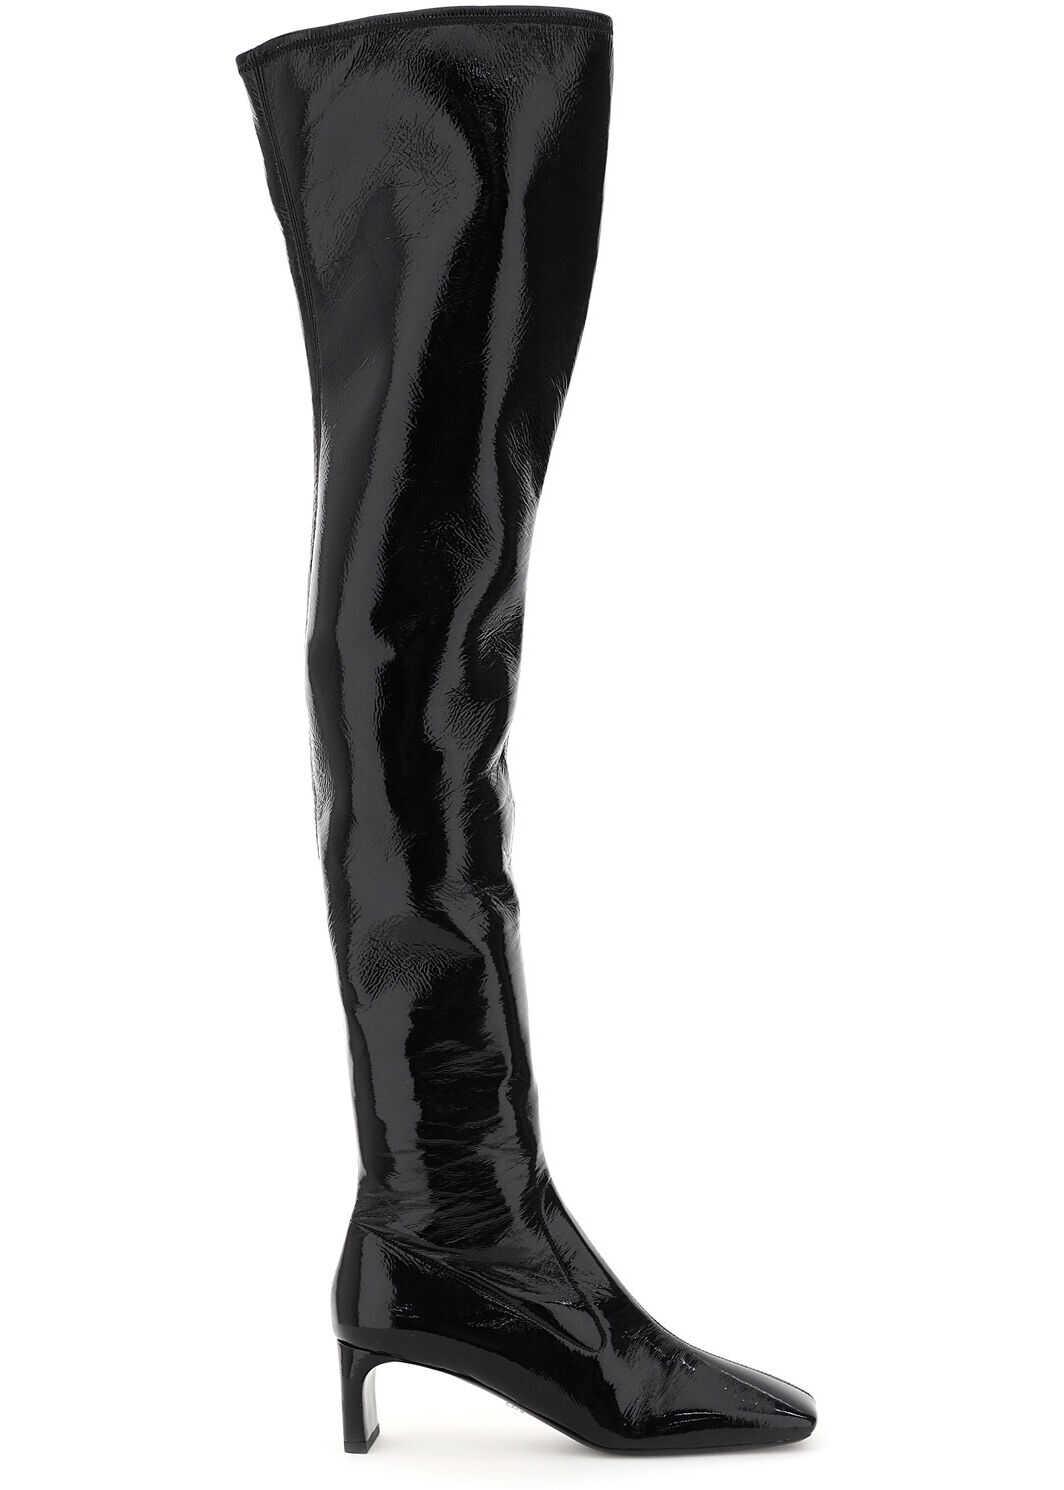 Prada Over-The-Knee Naplak Tech Boots 1W295M 3LBK NERO imagine b-mall.ro